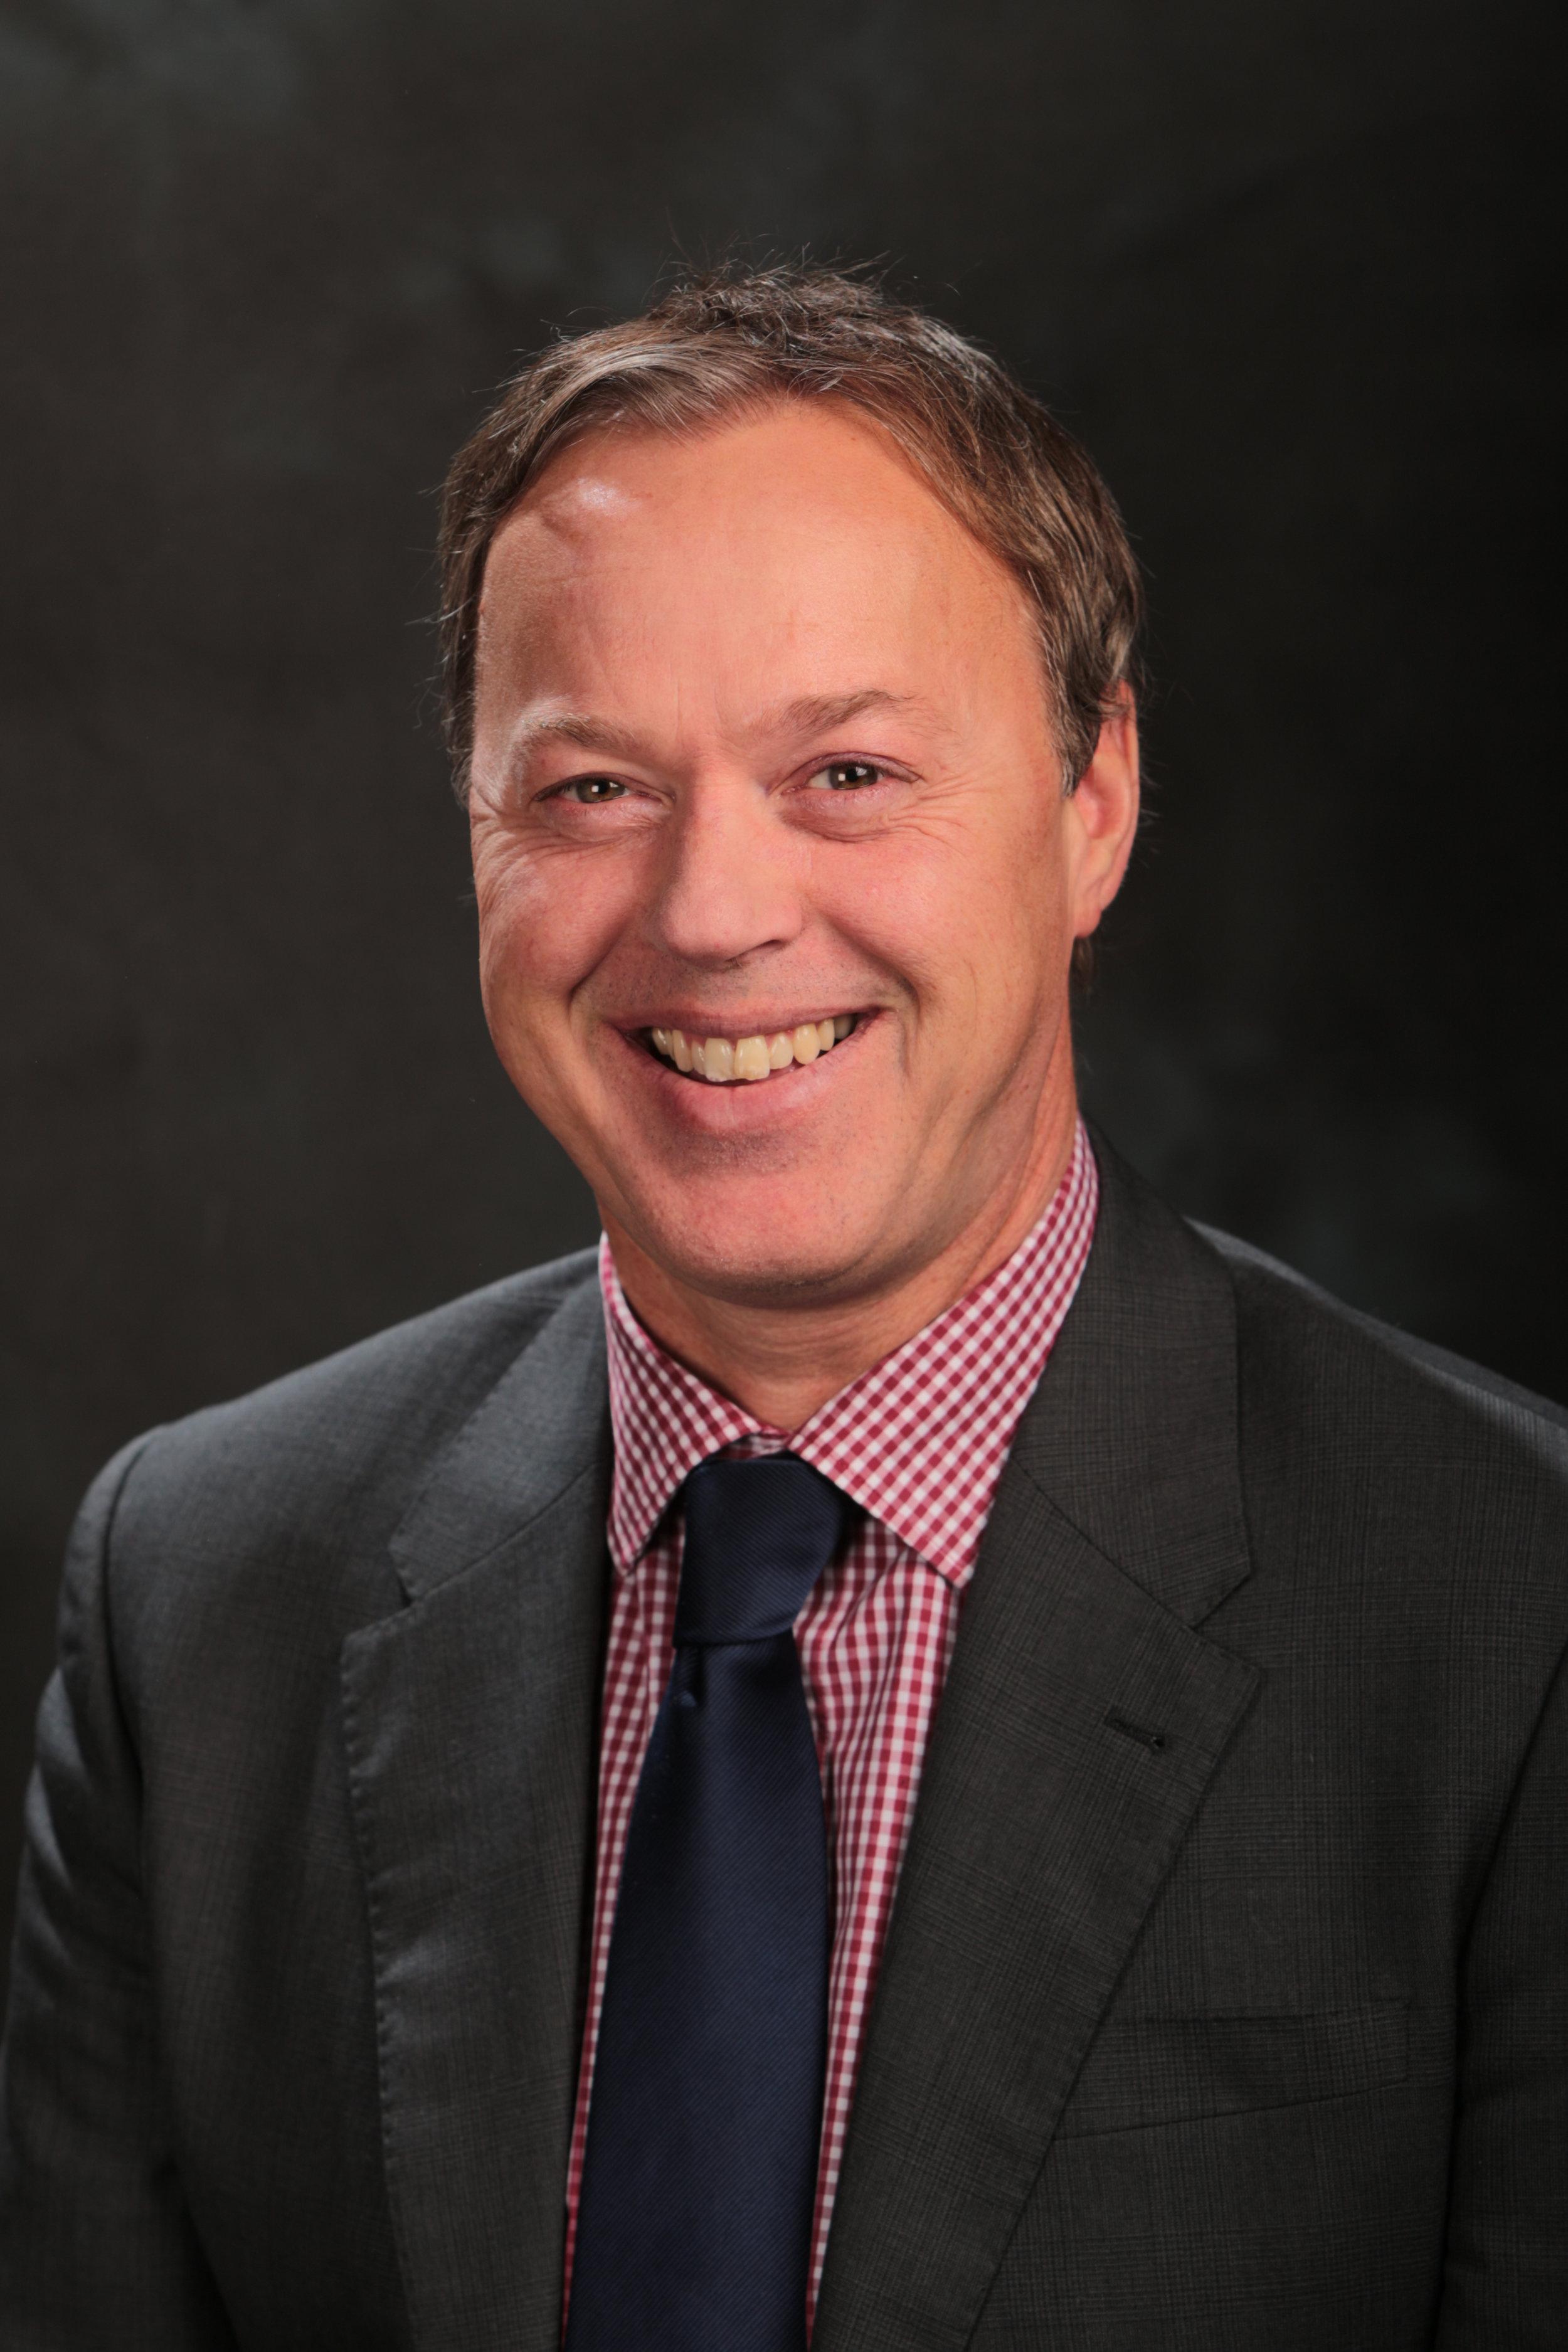 Stuart Hart, Director of business development, banff & lake louise tourism